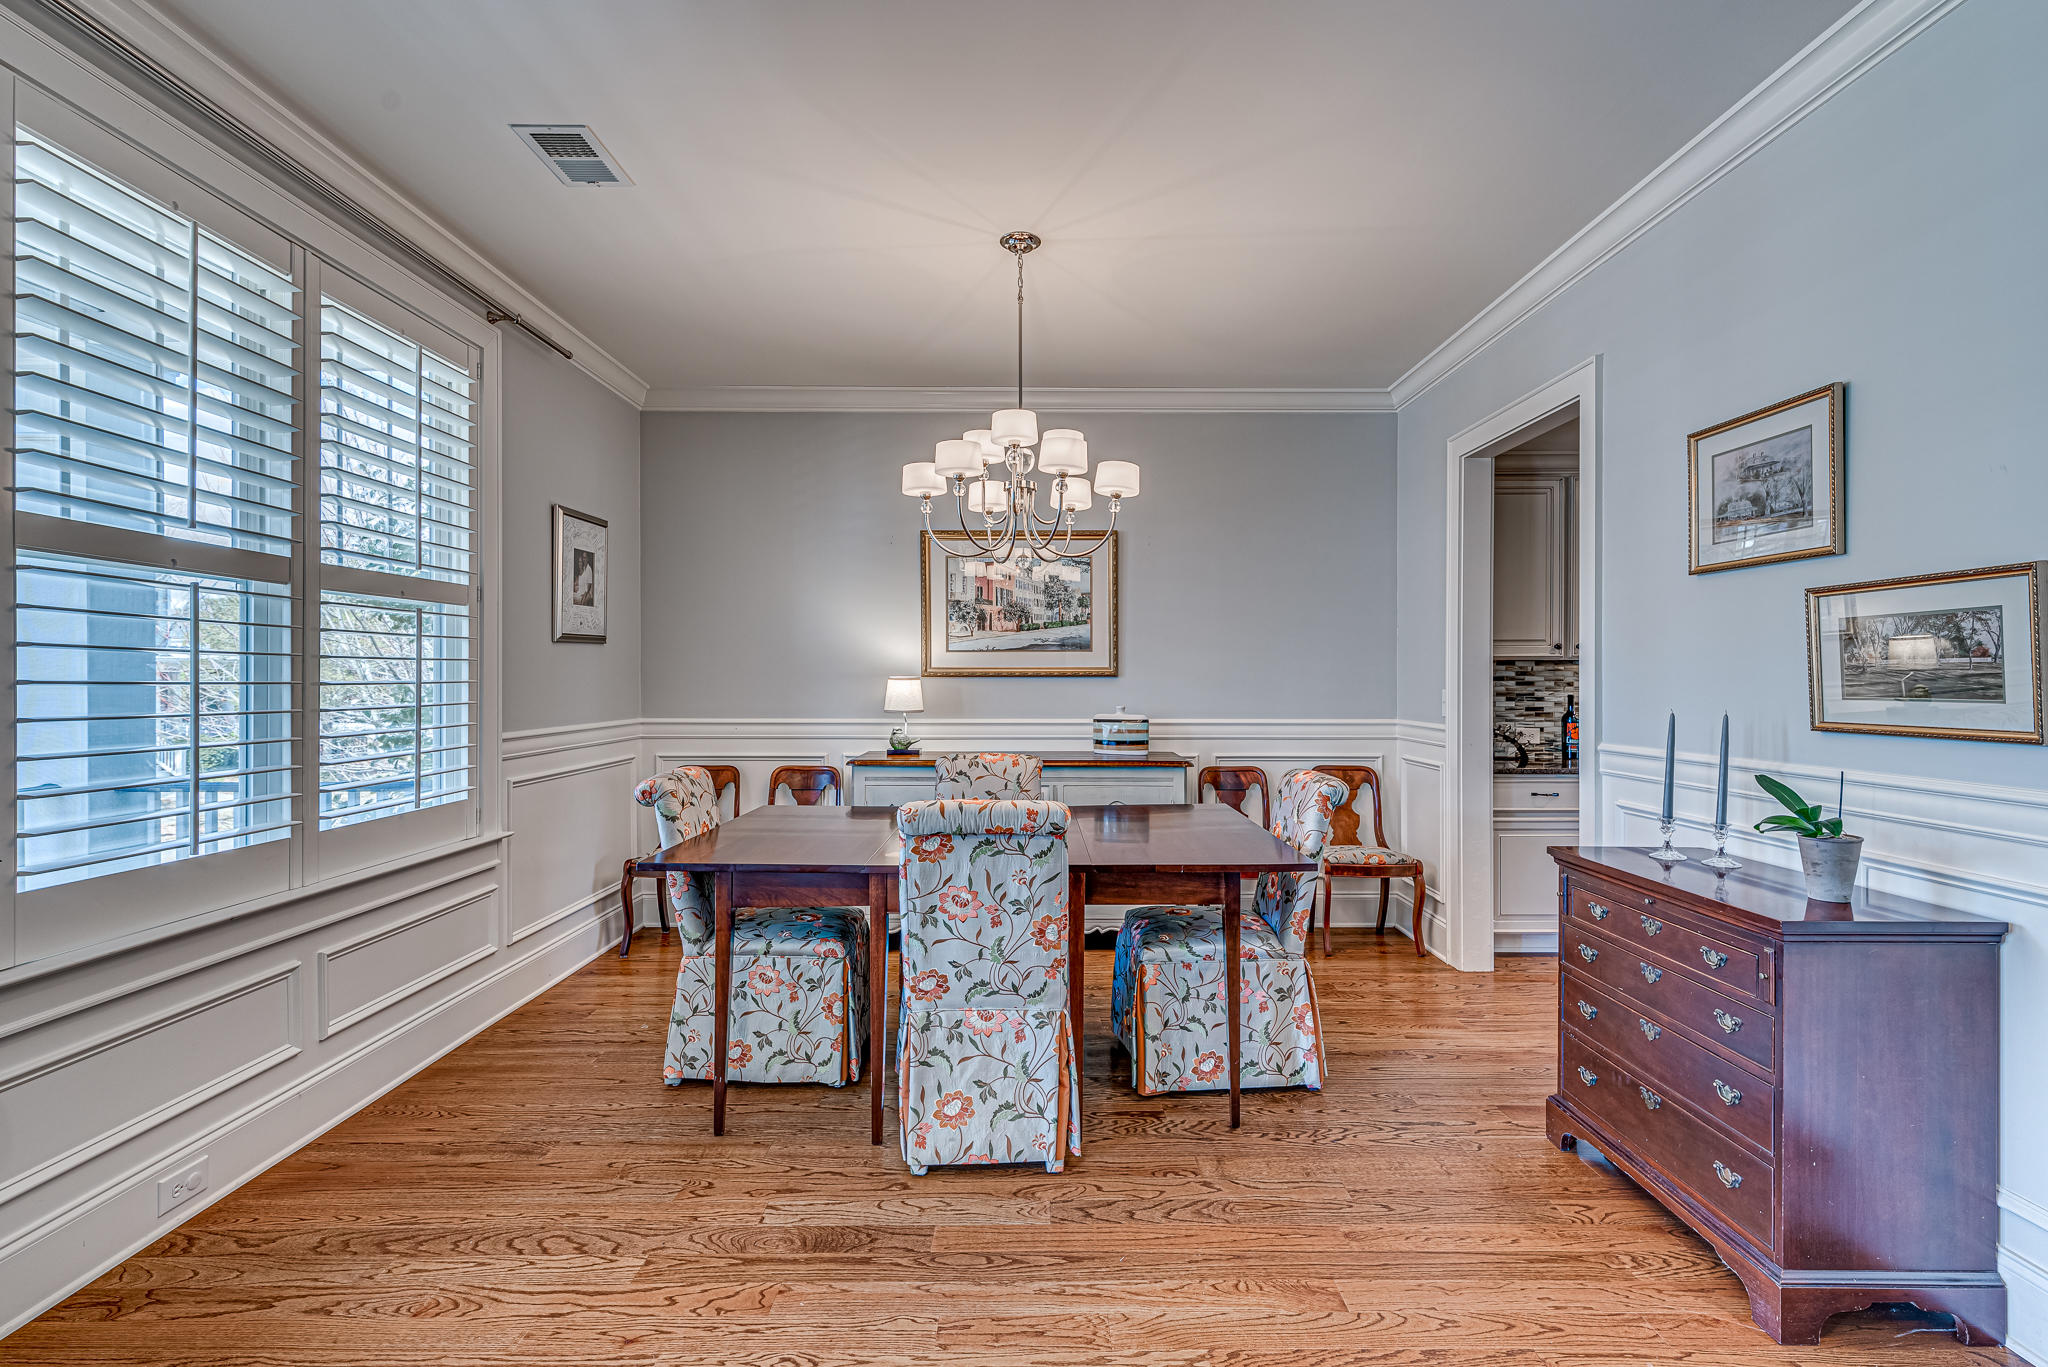 Daniel Island Smythe Park Homes For Sale - 1410 Wando View, Charleston, SC - 9